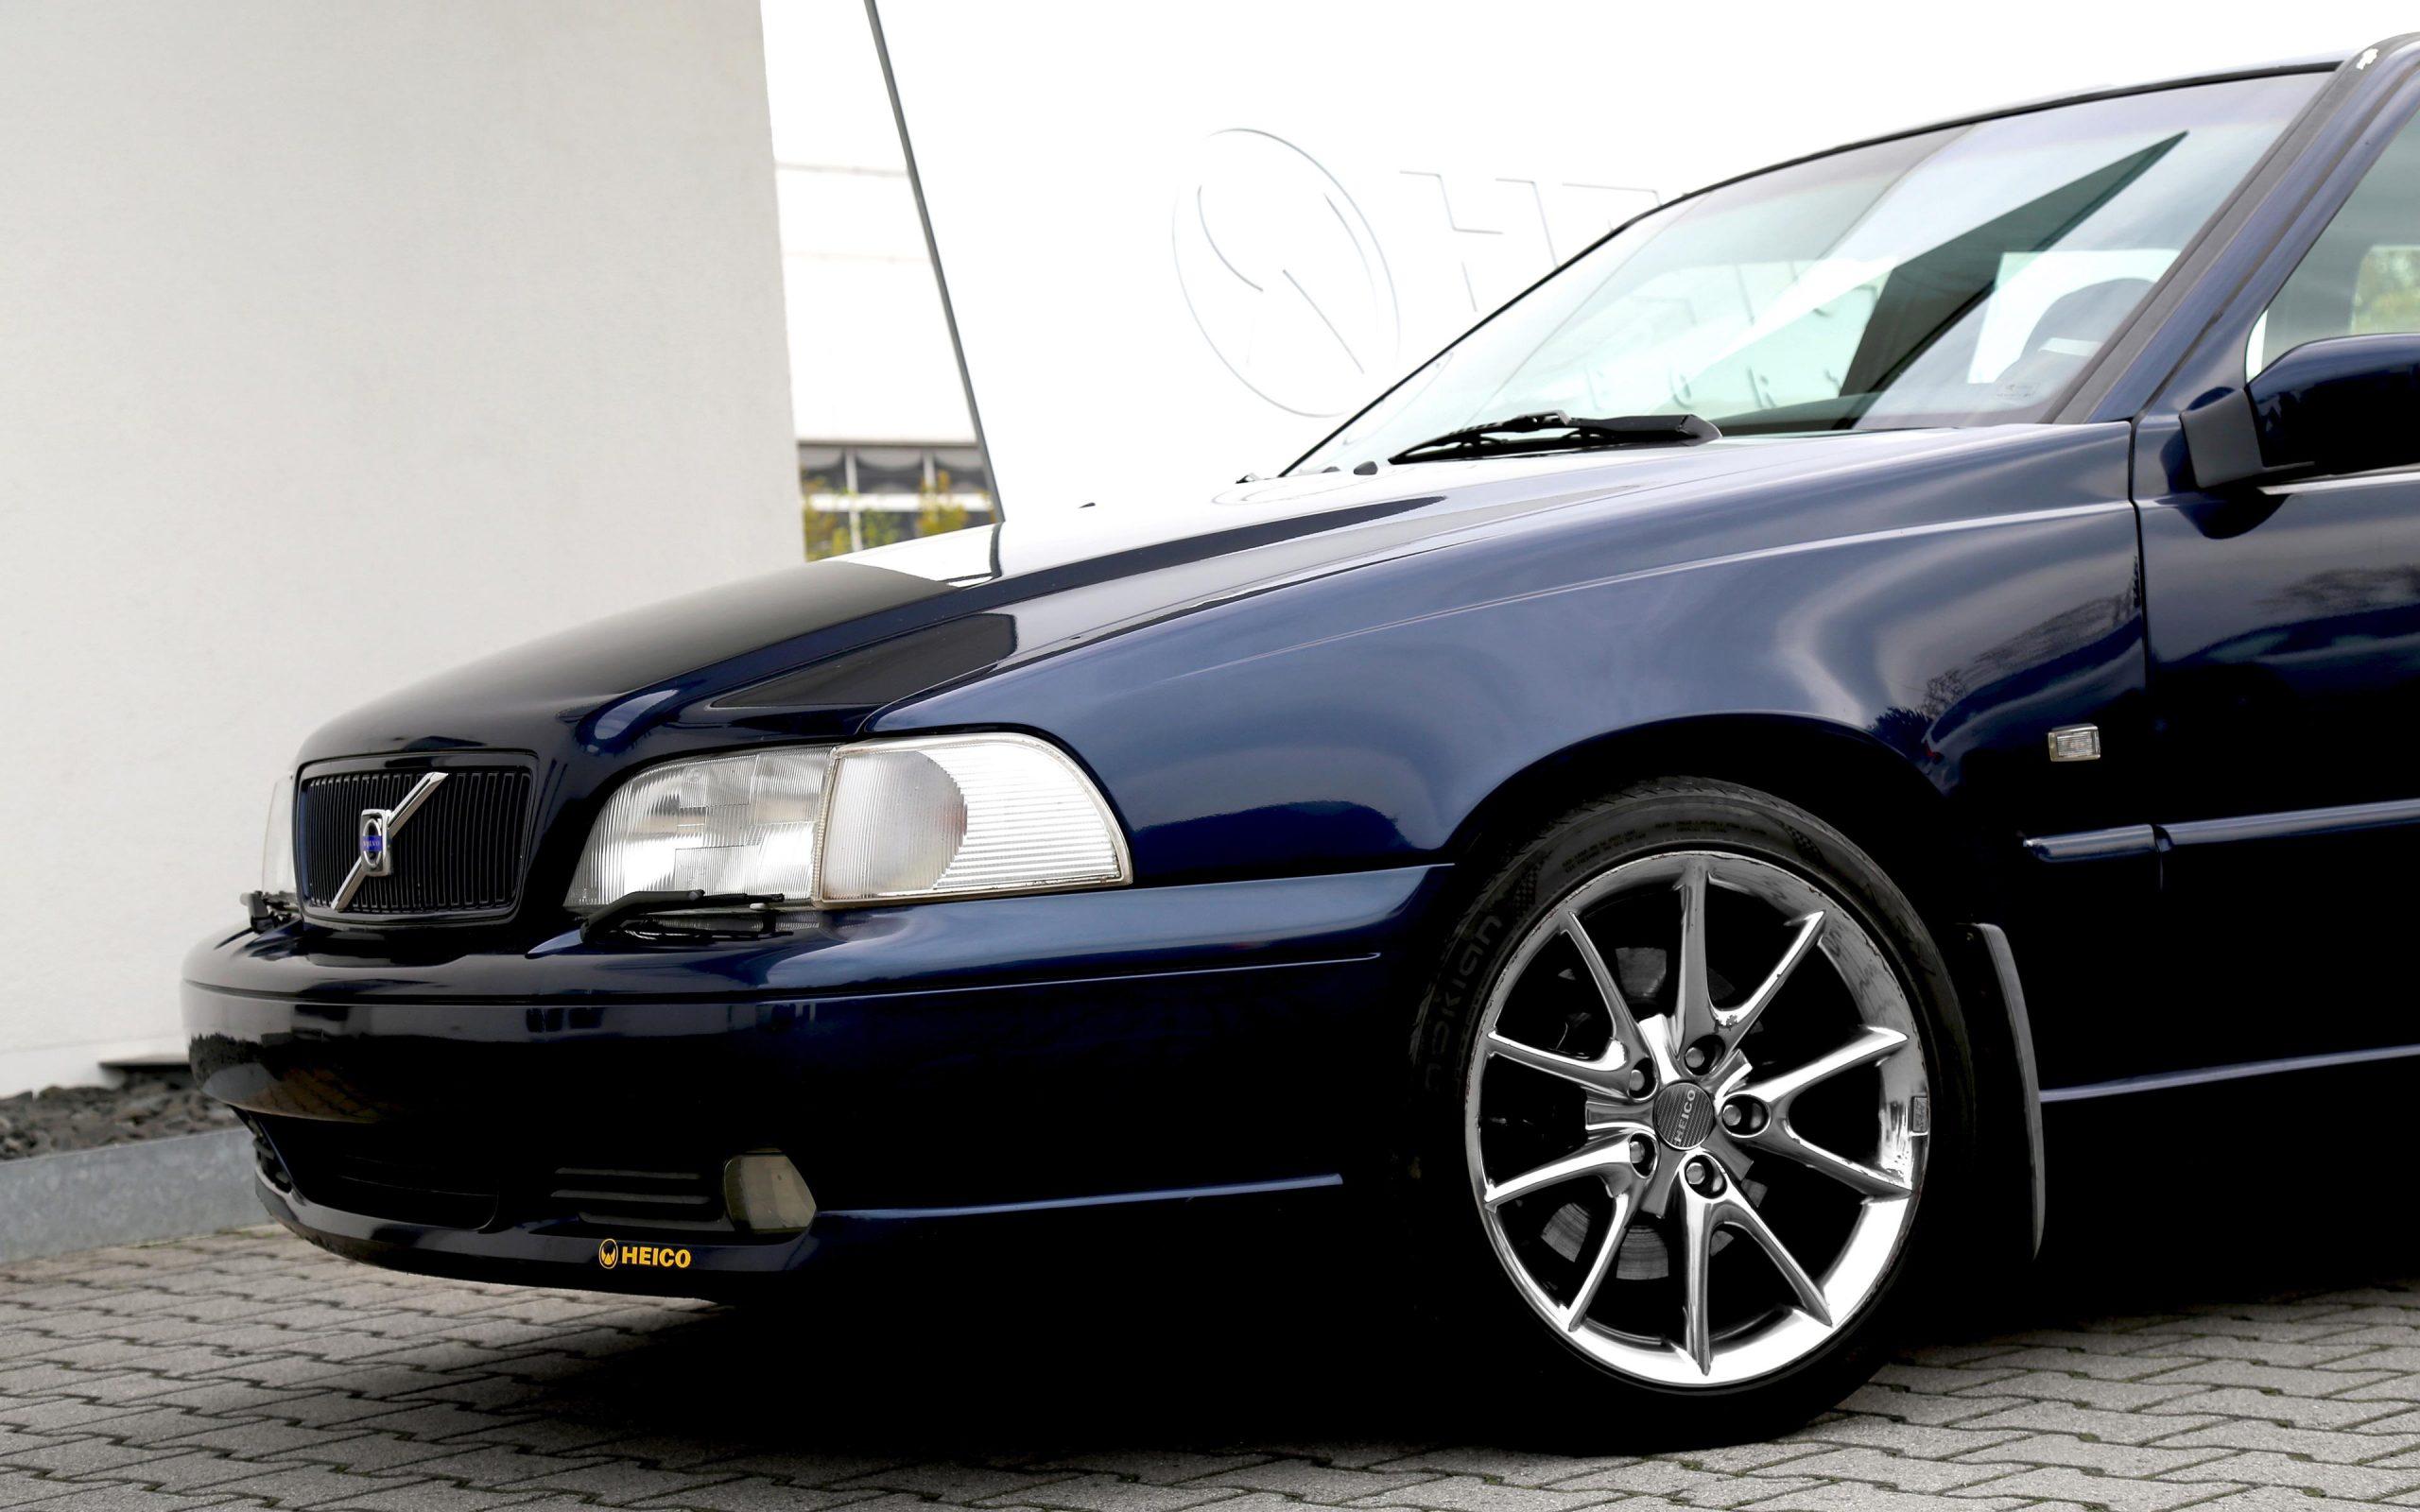 heico-sportiv-V70-edition-front-1